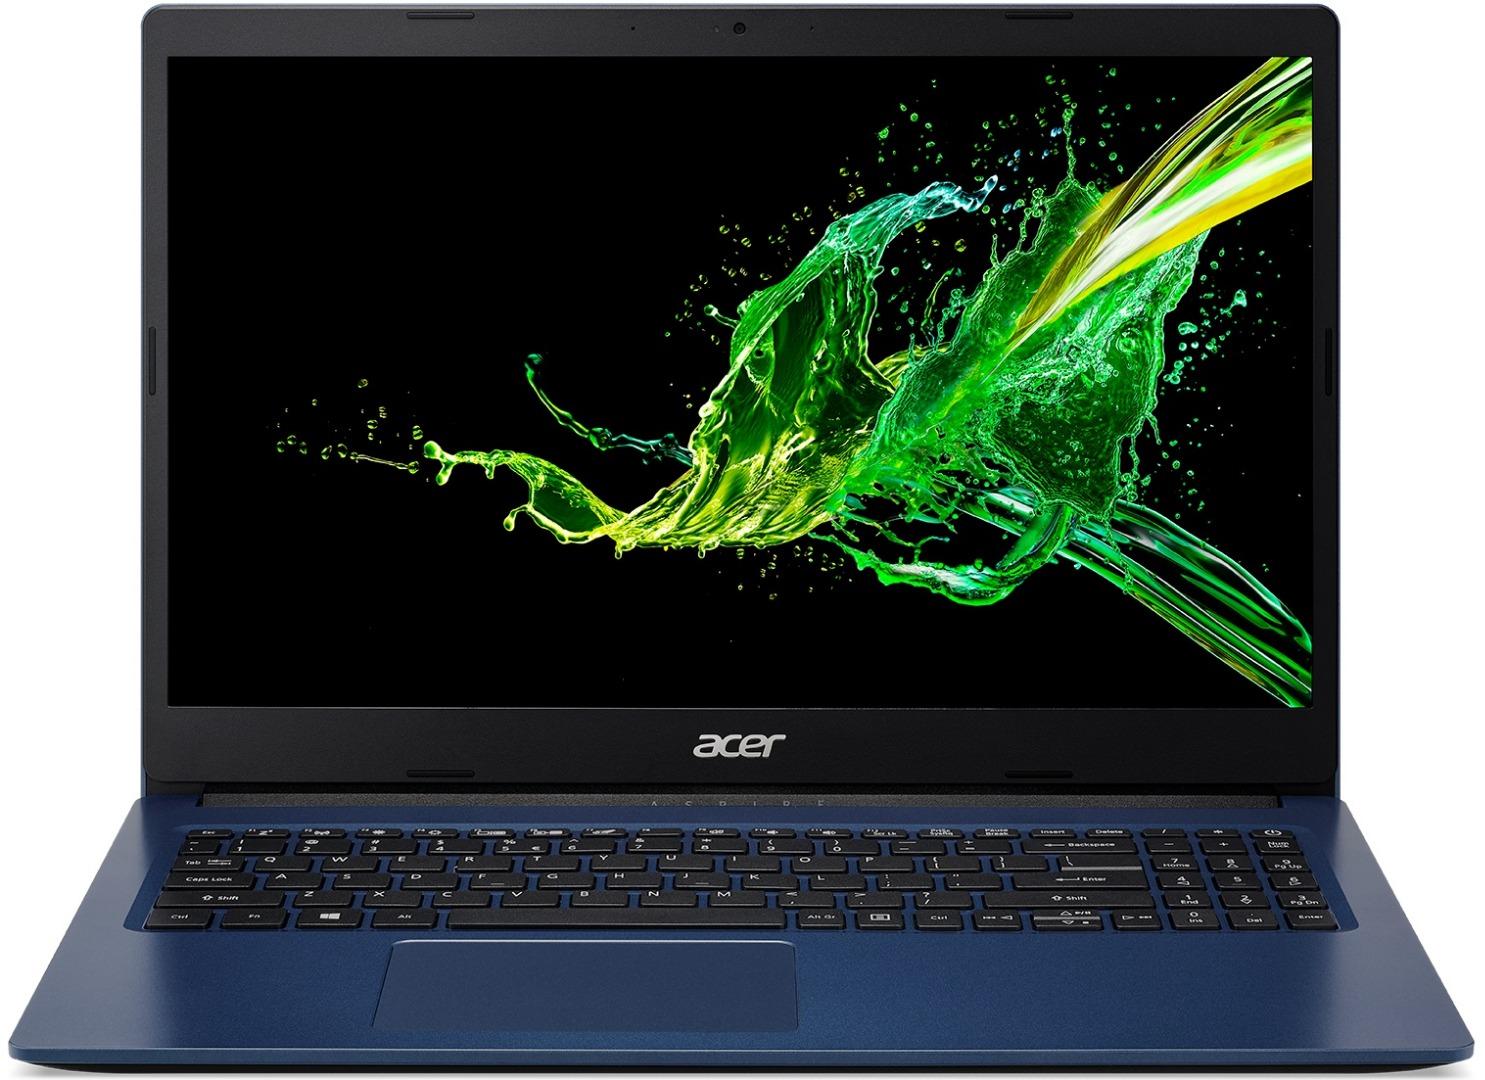 Купить Ноутбуки, Ноутбук Acer Aspire 3 A315-34-P4HQ NX.HG9EU.015 Blue